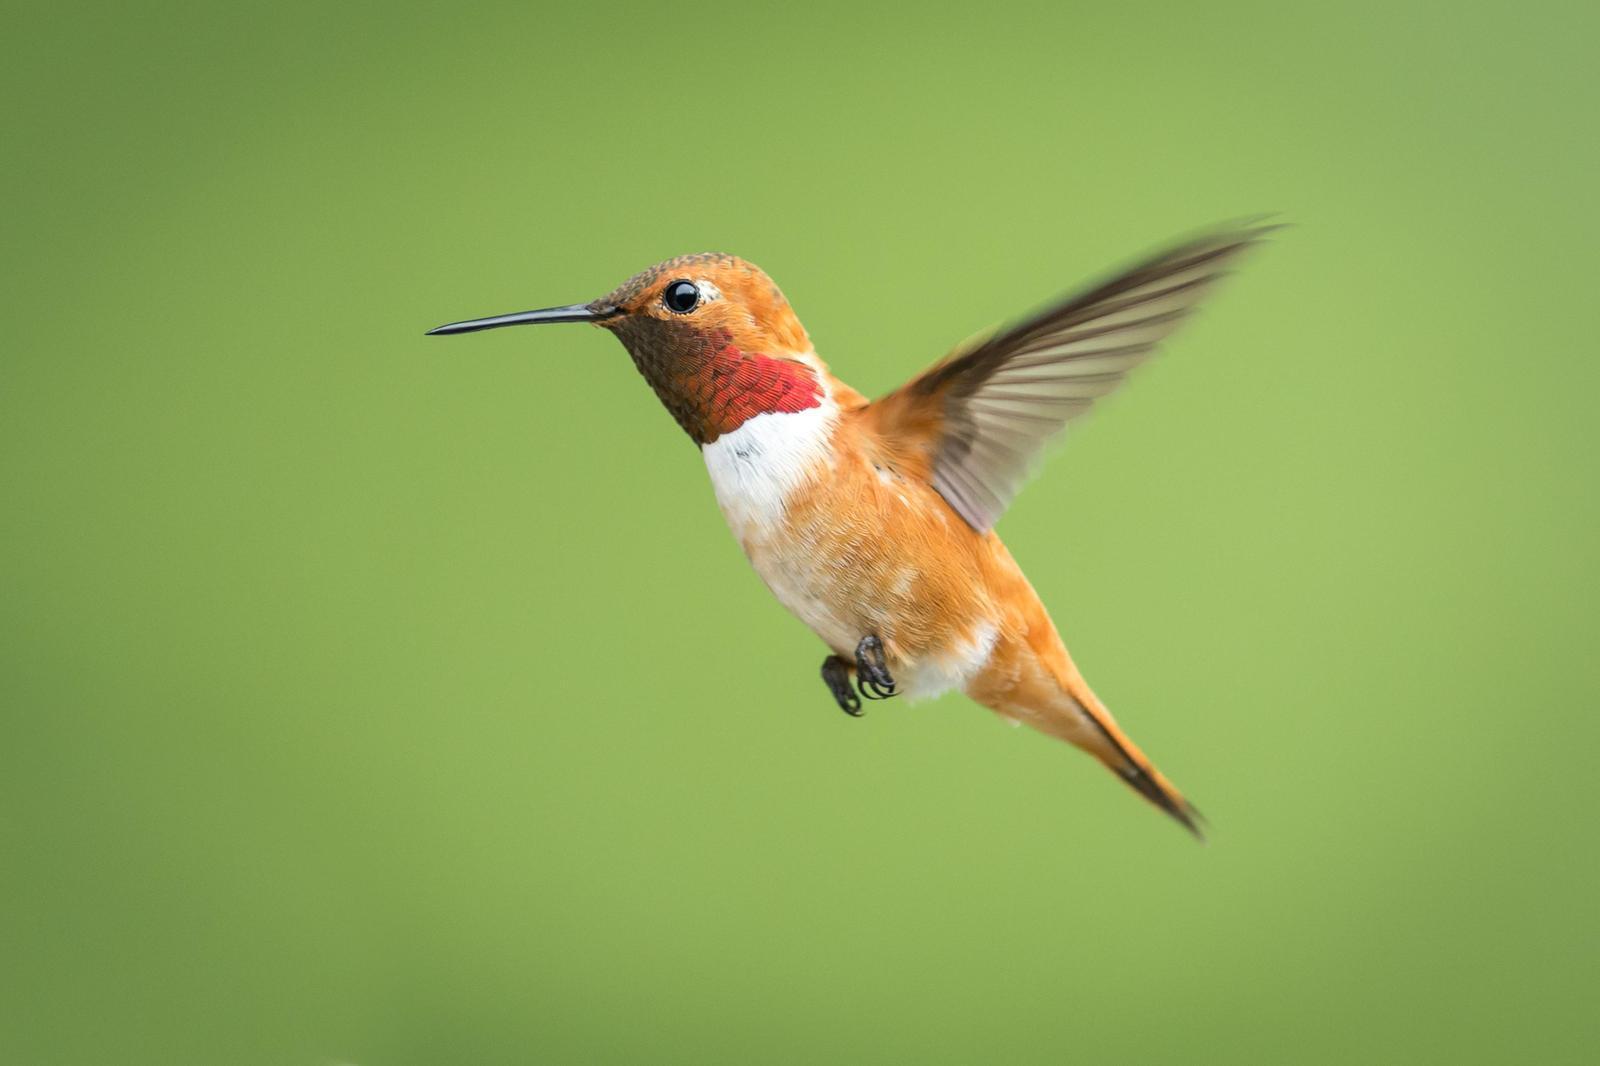 Rufous Hummingbird Photo by Jesse Hodges